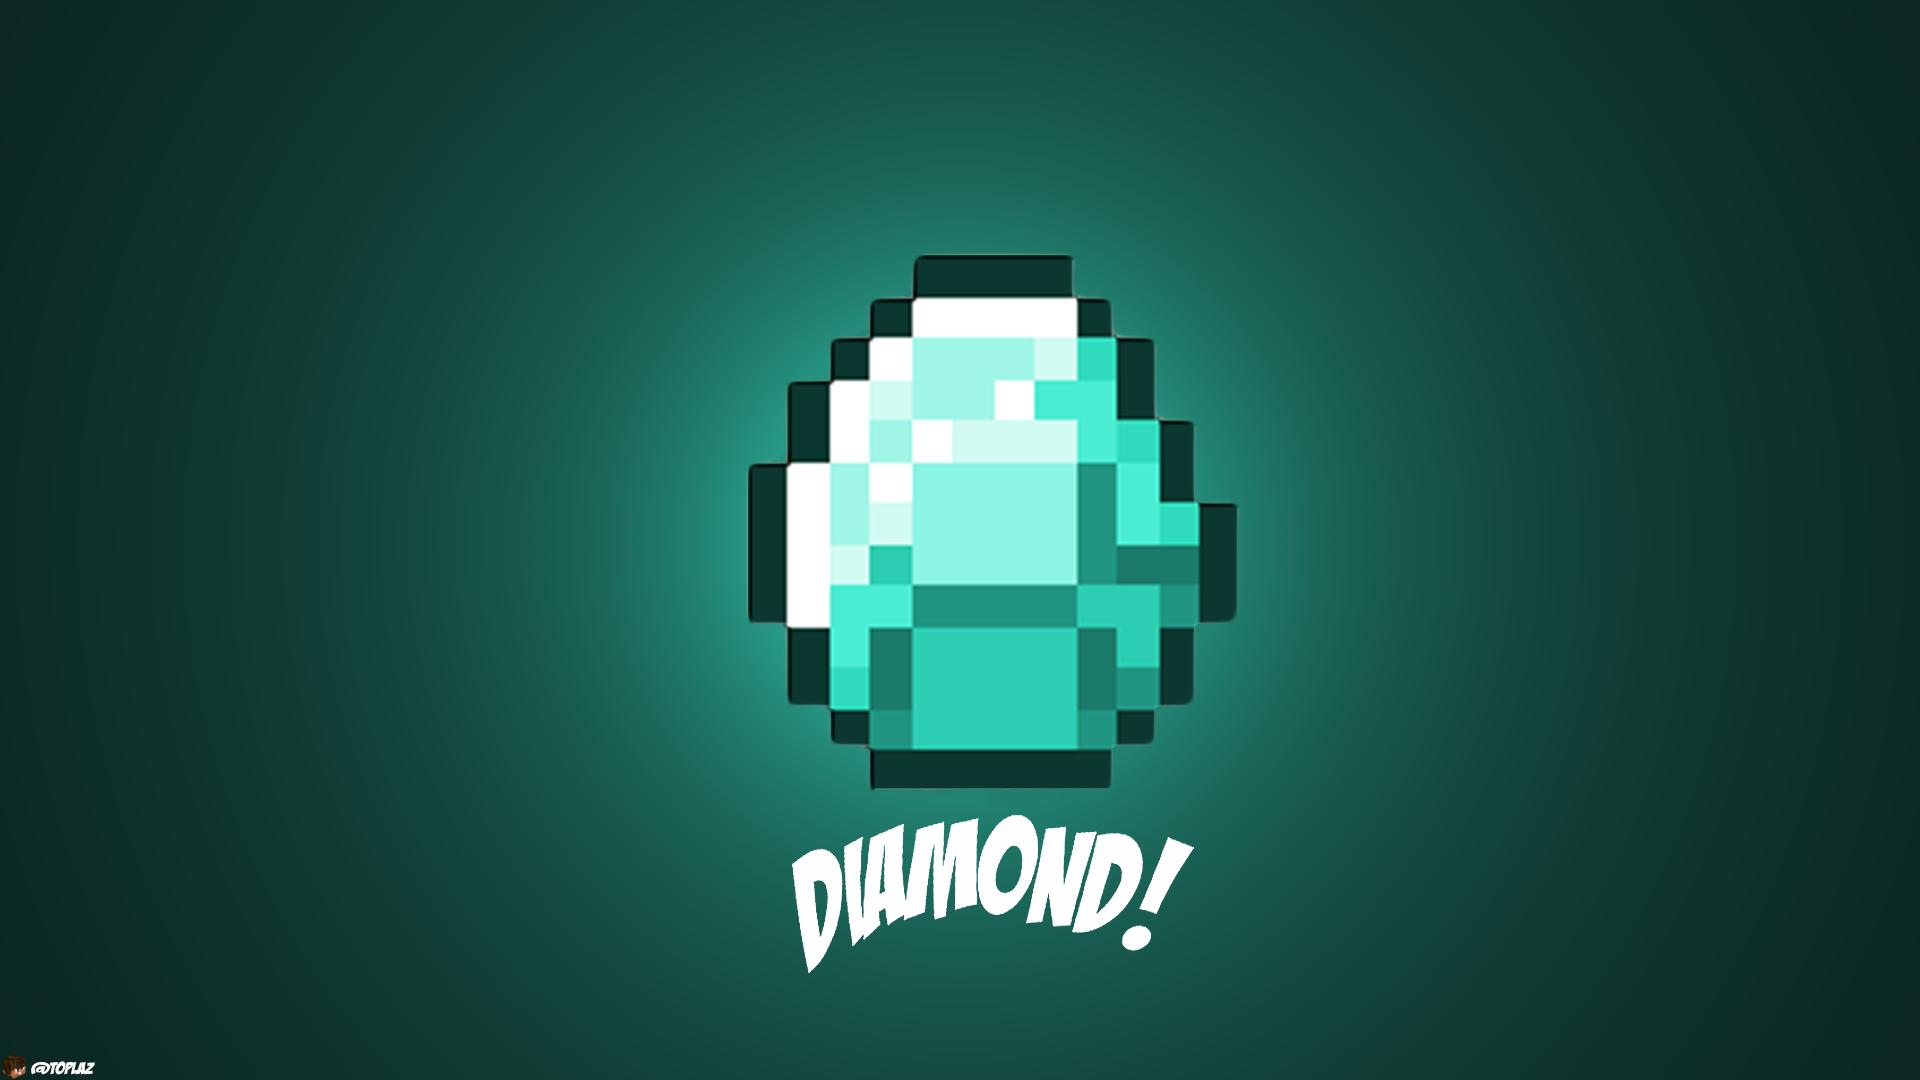 Daniannarincon Minecraft Diamond Wallpaper Images 1920x1080